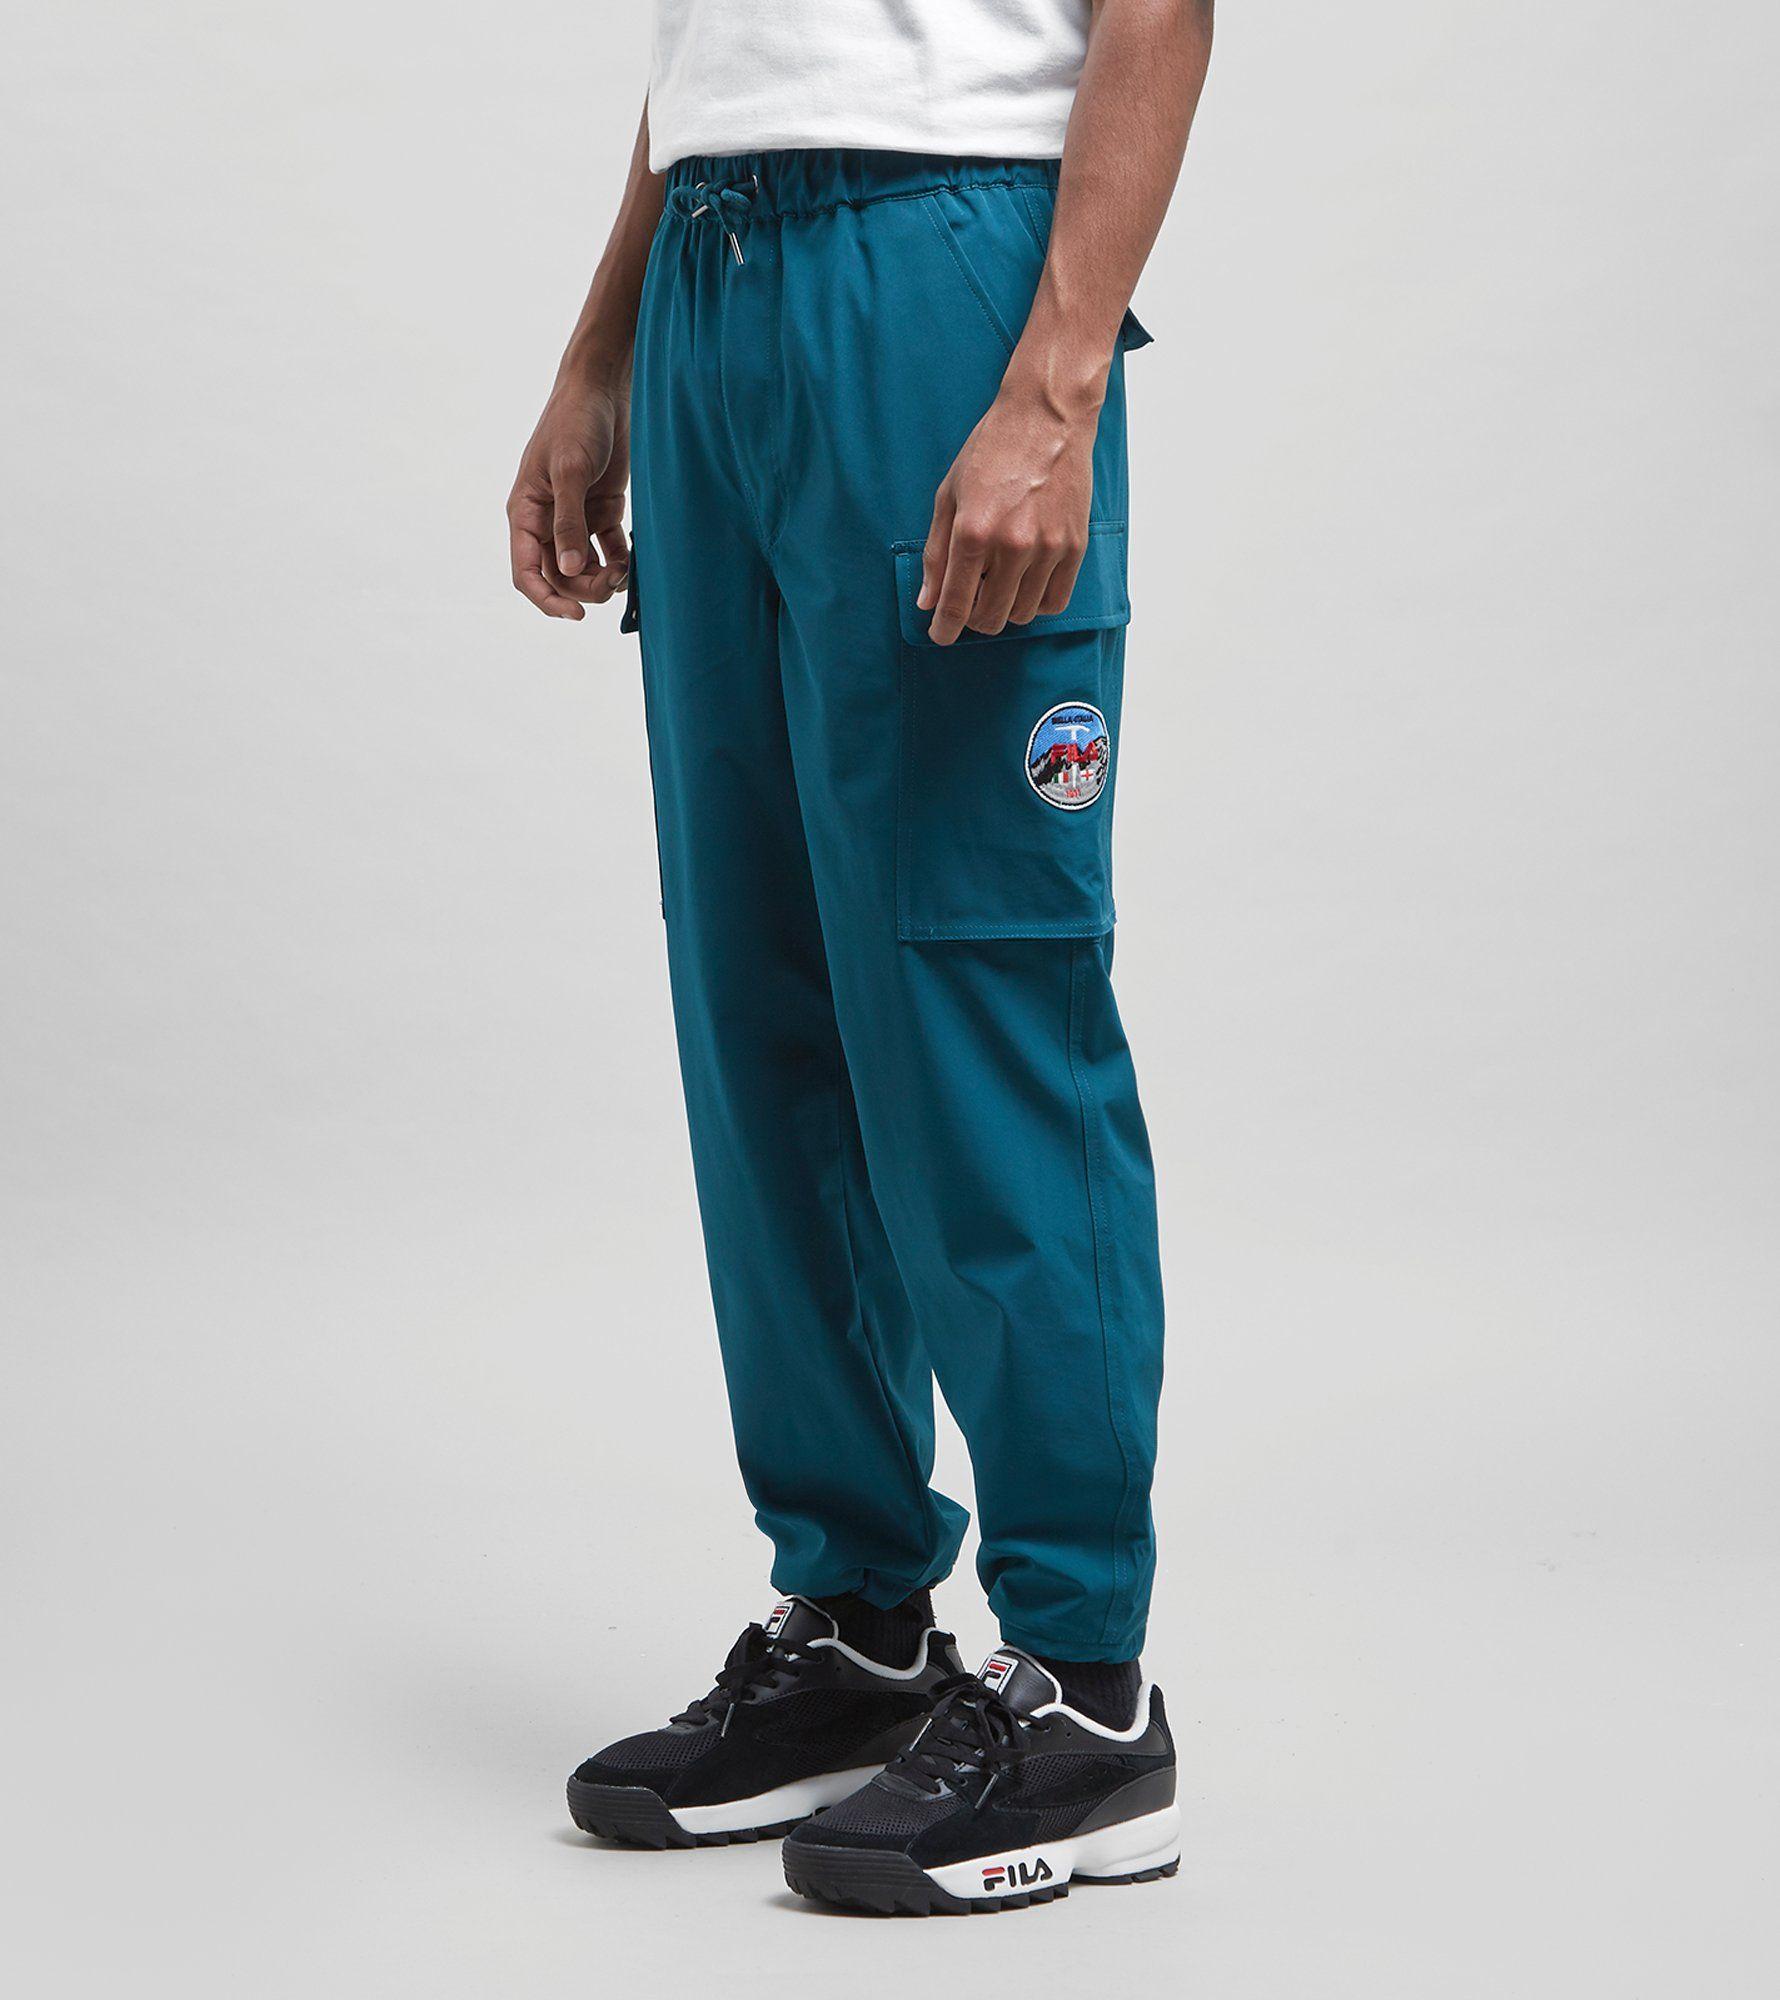 Fila Youla Cargo Pants - size?exclusive